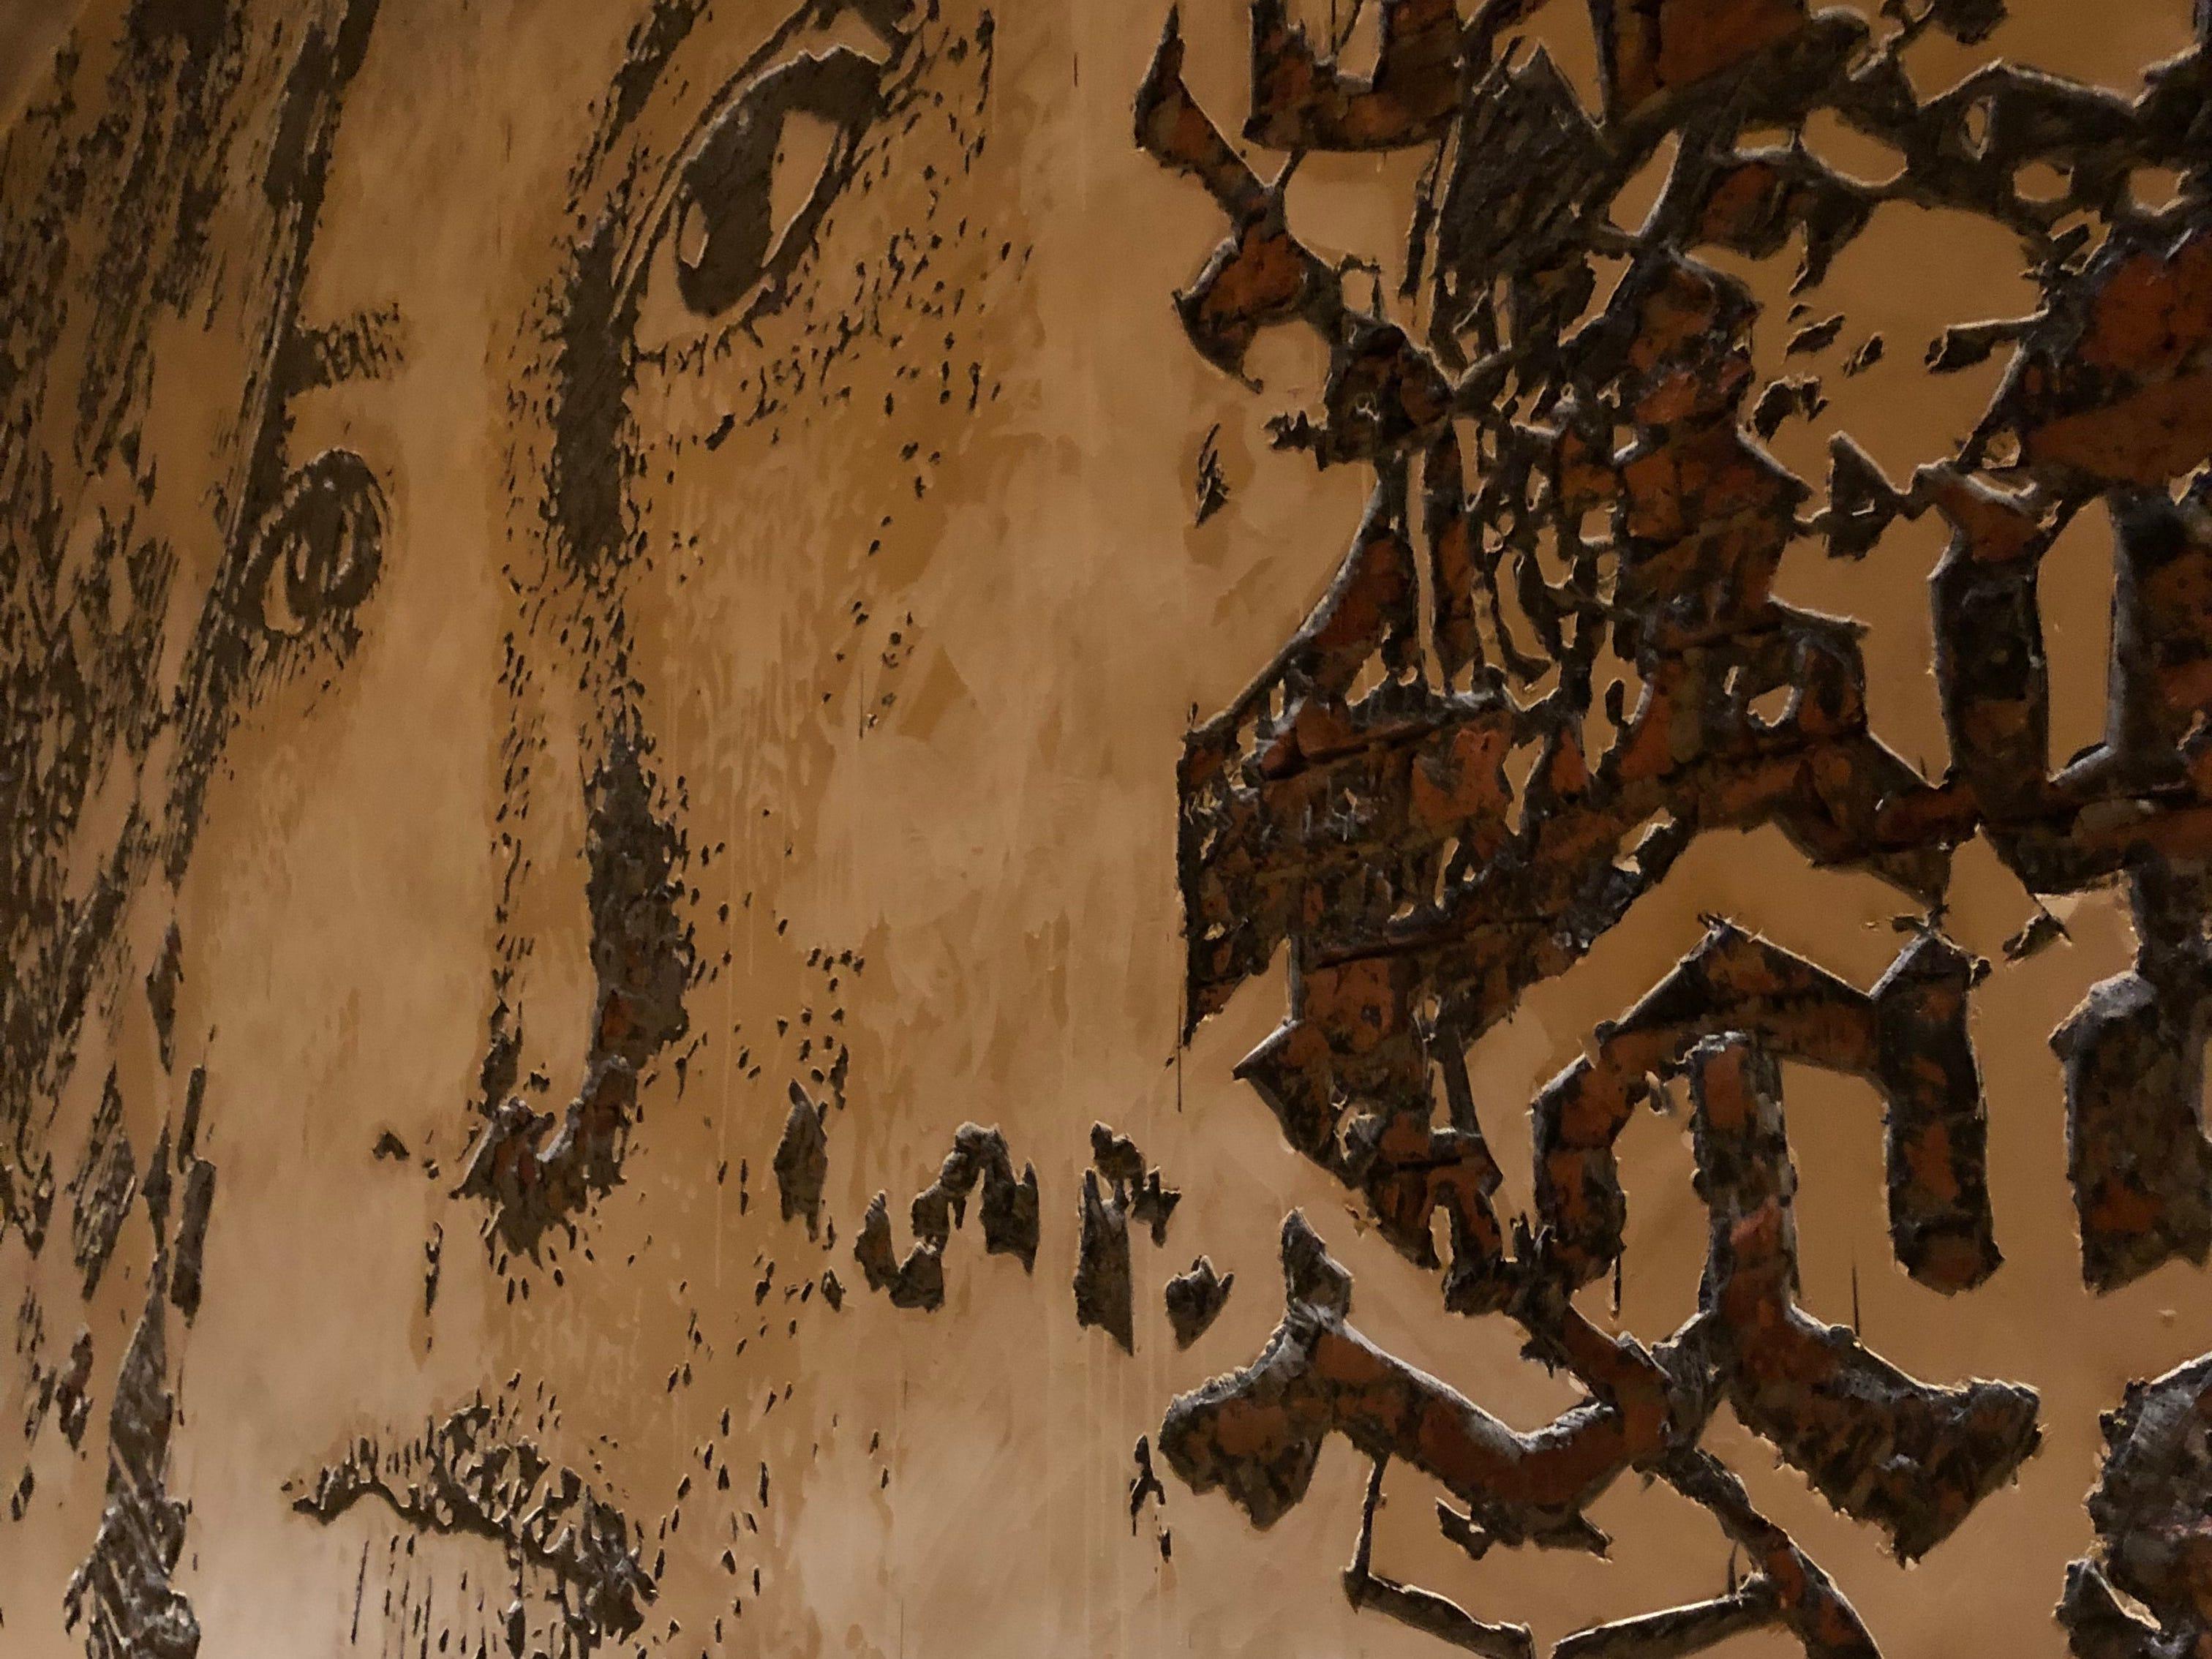 Artwork in the Greene St. Kitchen in the Palms Casino Resort in Las Vegas.